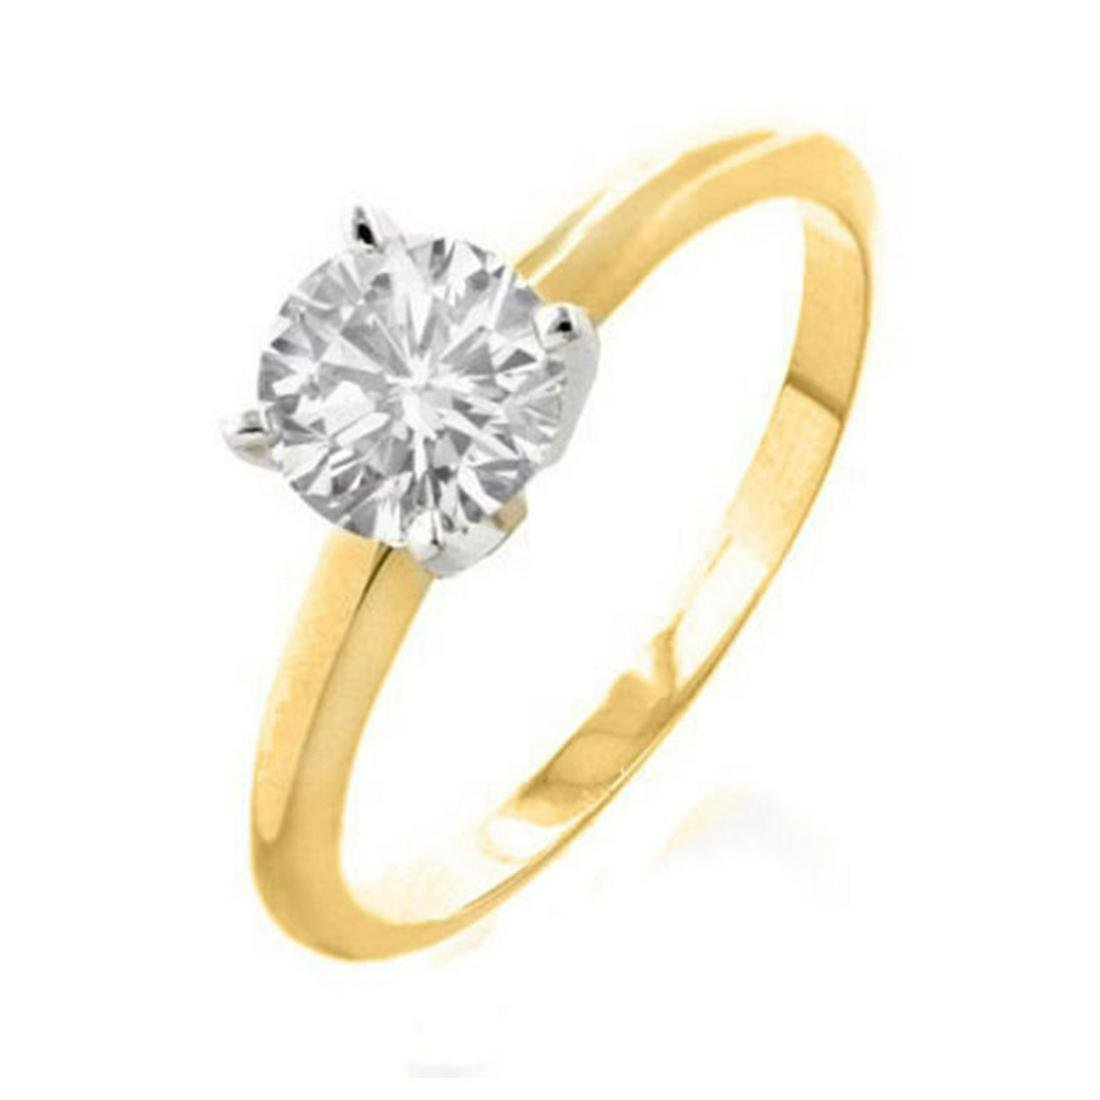 1.50 ctw VS/SI Diamond Ring 14K Yellow Gold